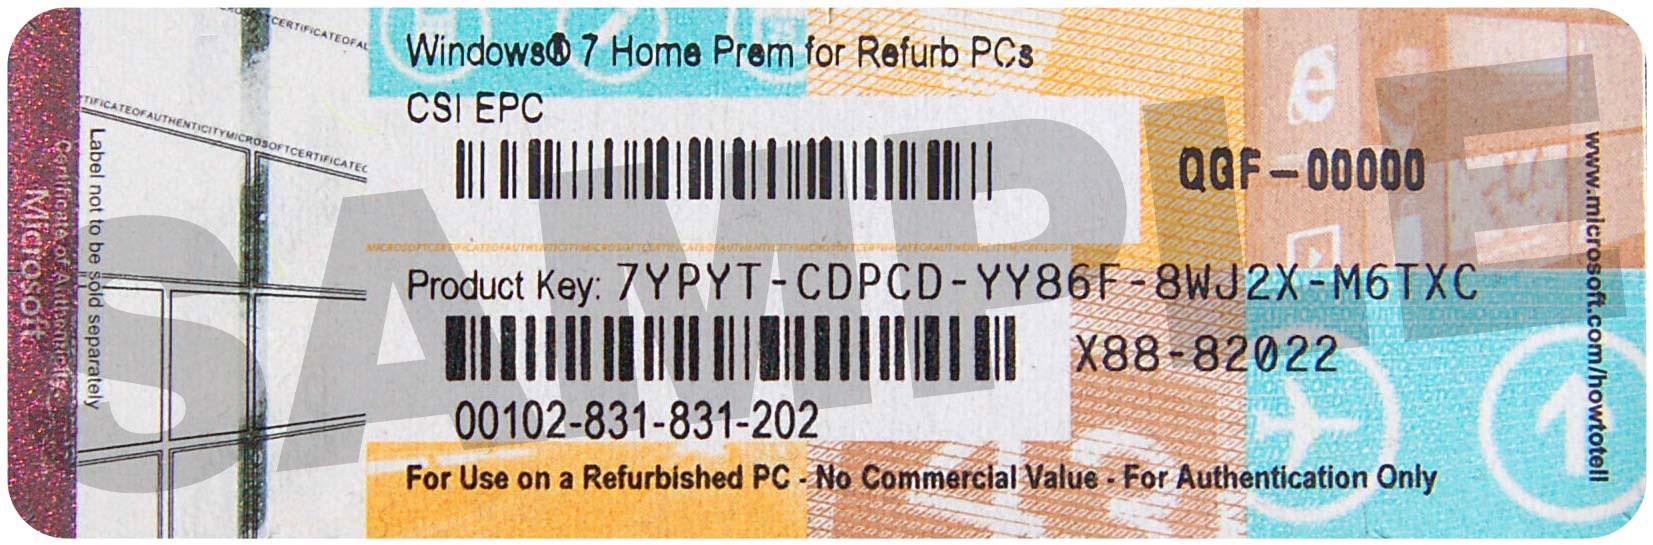 product keys for windows 7 home premium